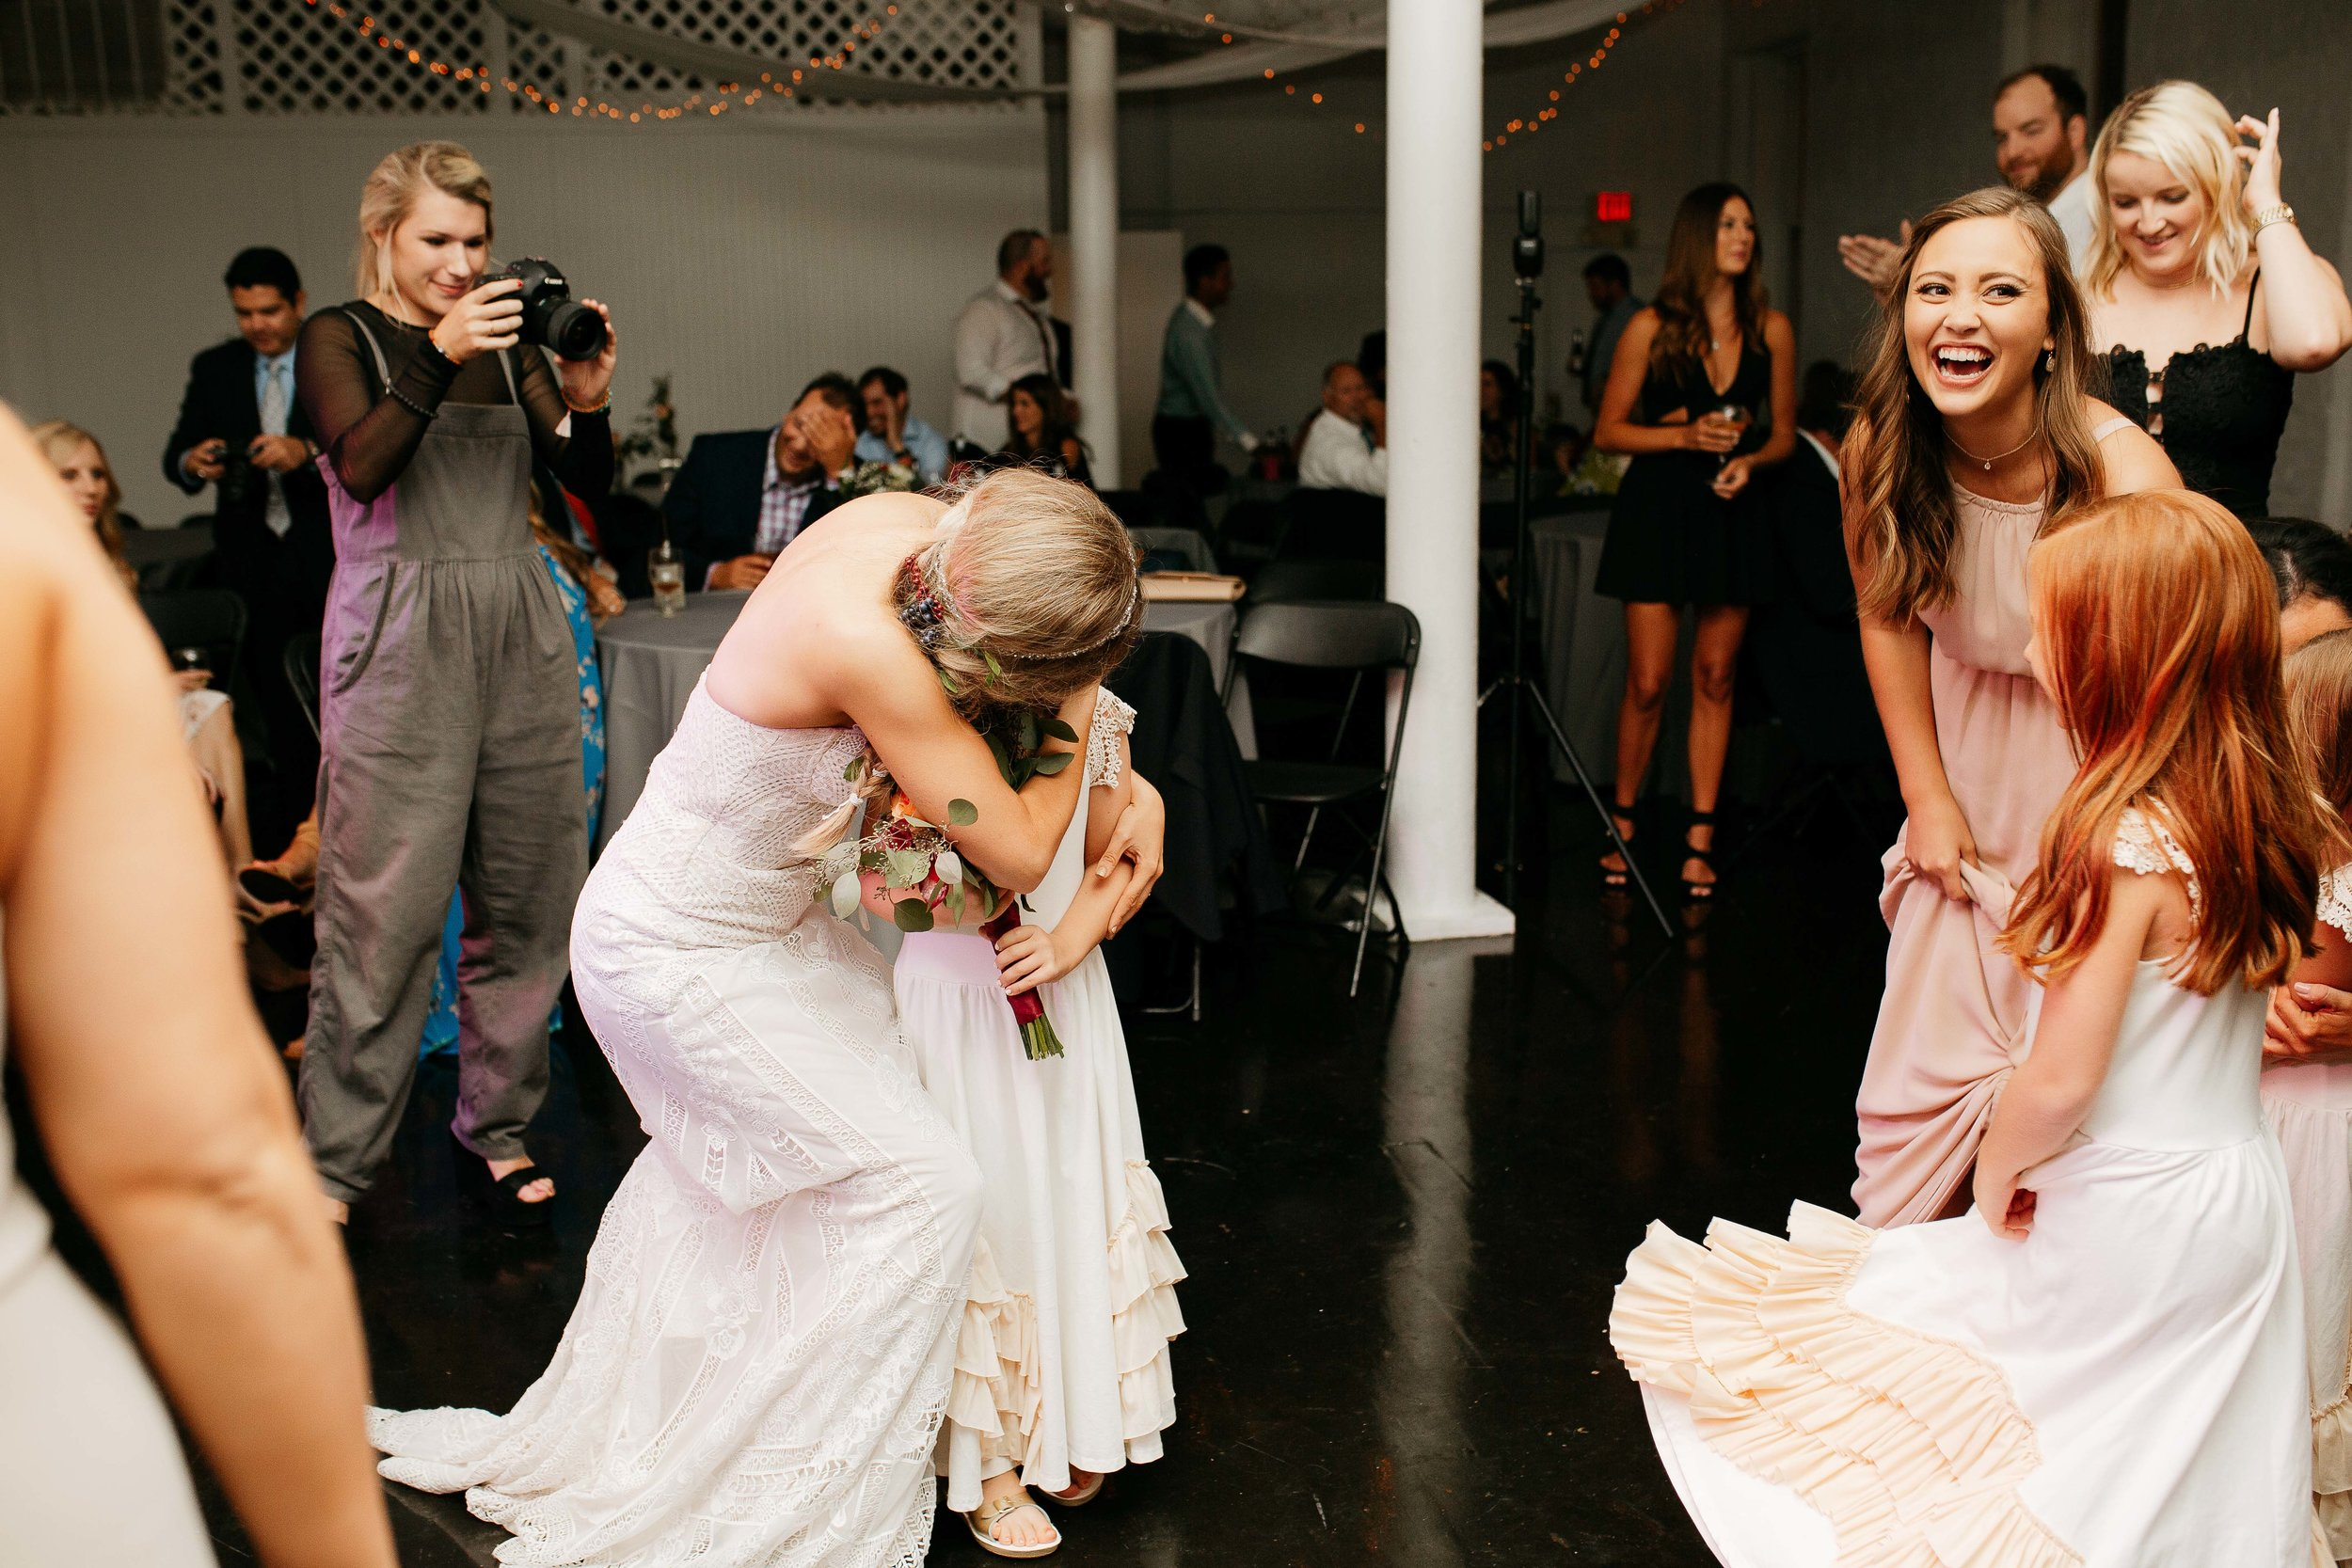 memphis tn wedding-106.jpg